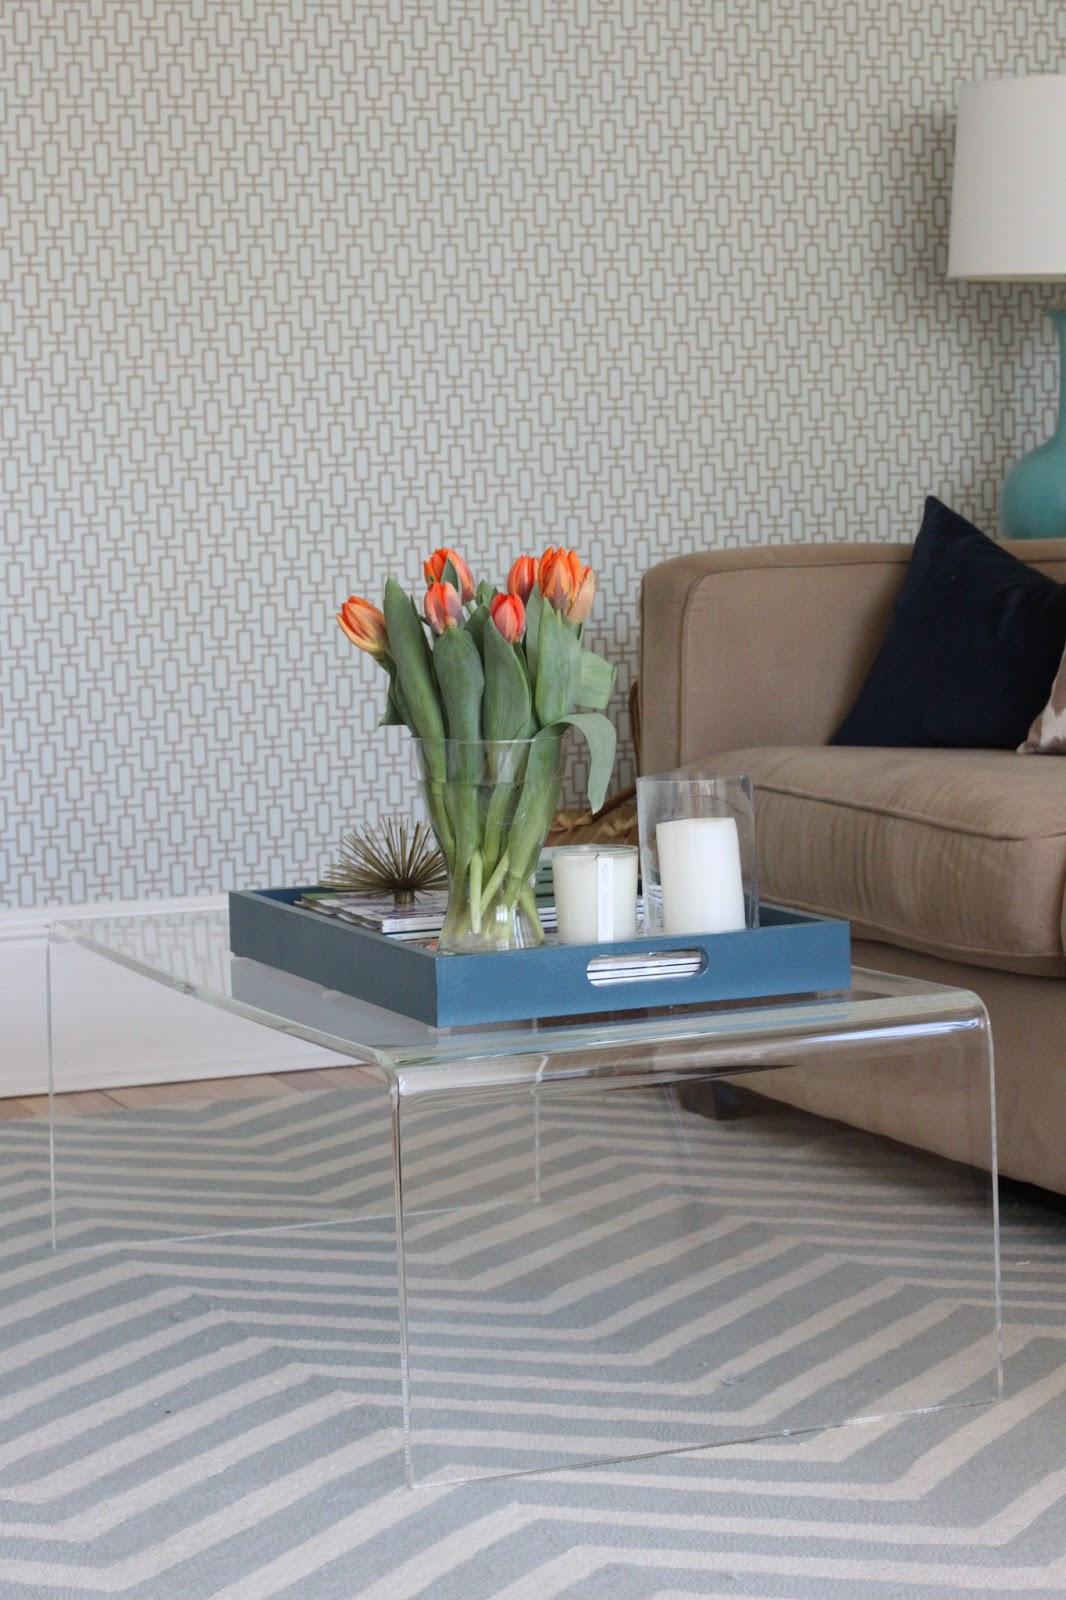 Superb Modern Jane Peekaboo Table Inzonedesignstudio Interior Chair Design Inzonedesignstudiocom